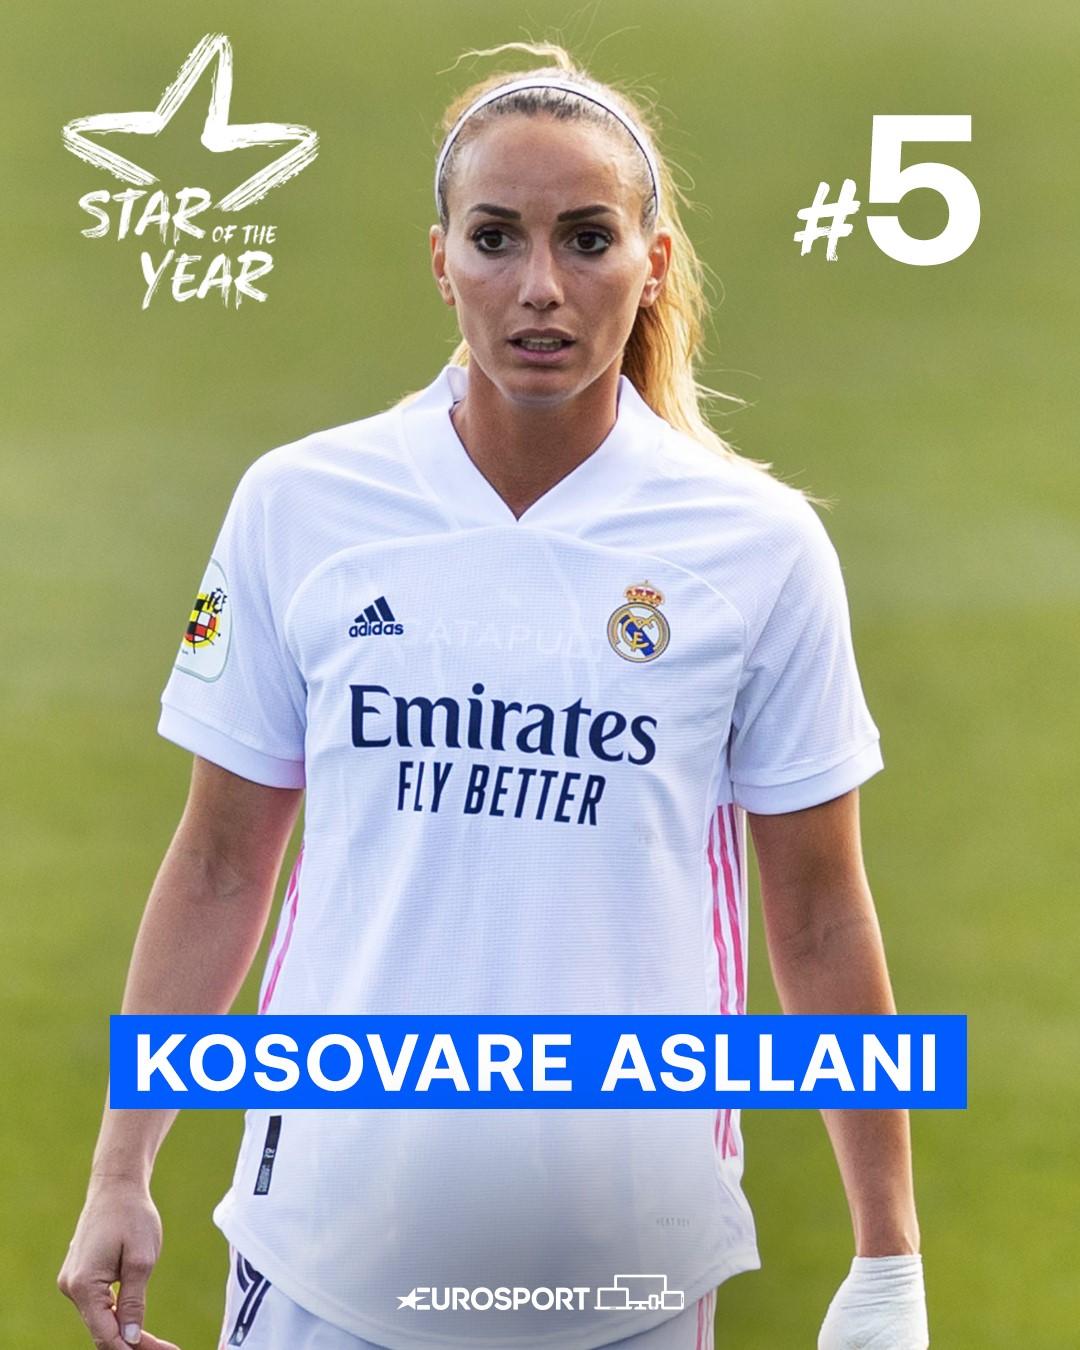 https://i.eurosport.com/2020/12/14/2955454.jpg